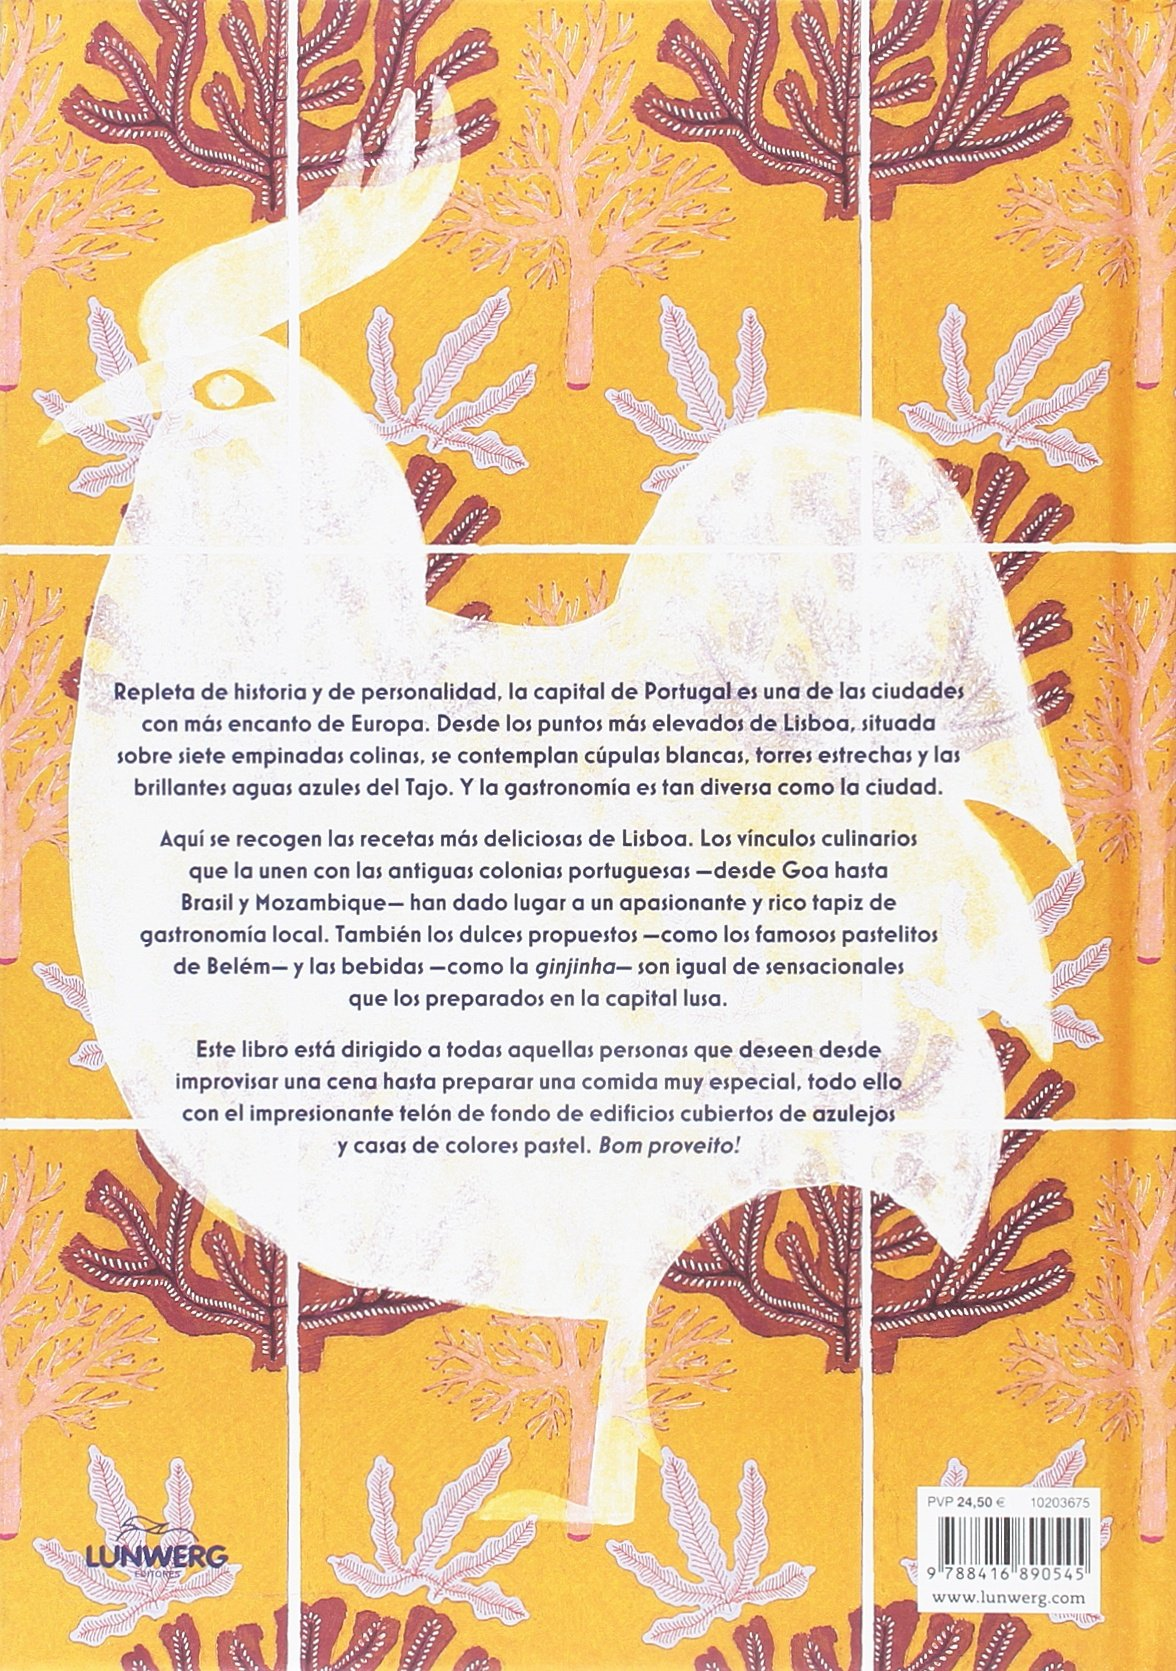 Lisboa. Recetas desde el coraz�n de Portugal: Rebecca / Joyce, Steven Seal: 9788416890545: Amazon.com: Books